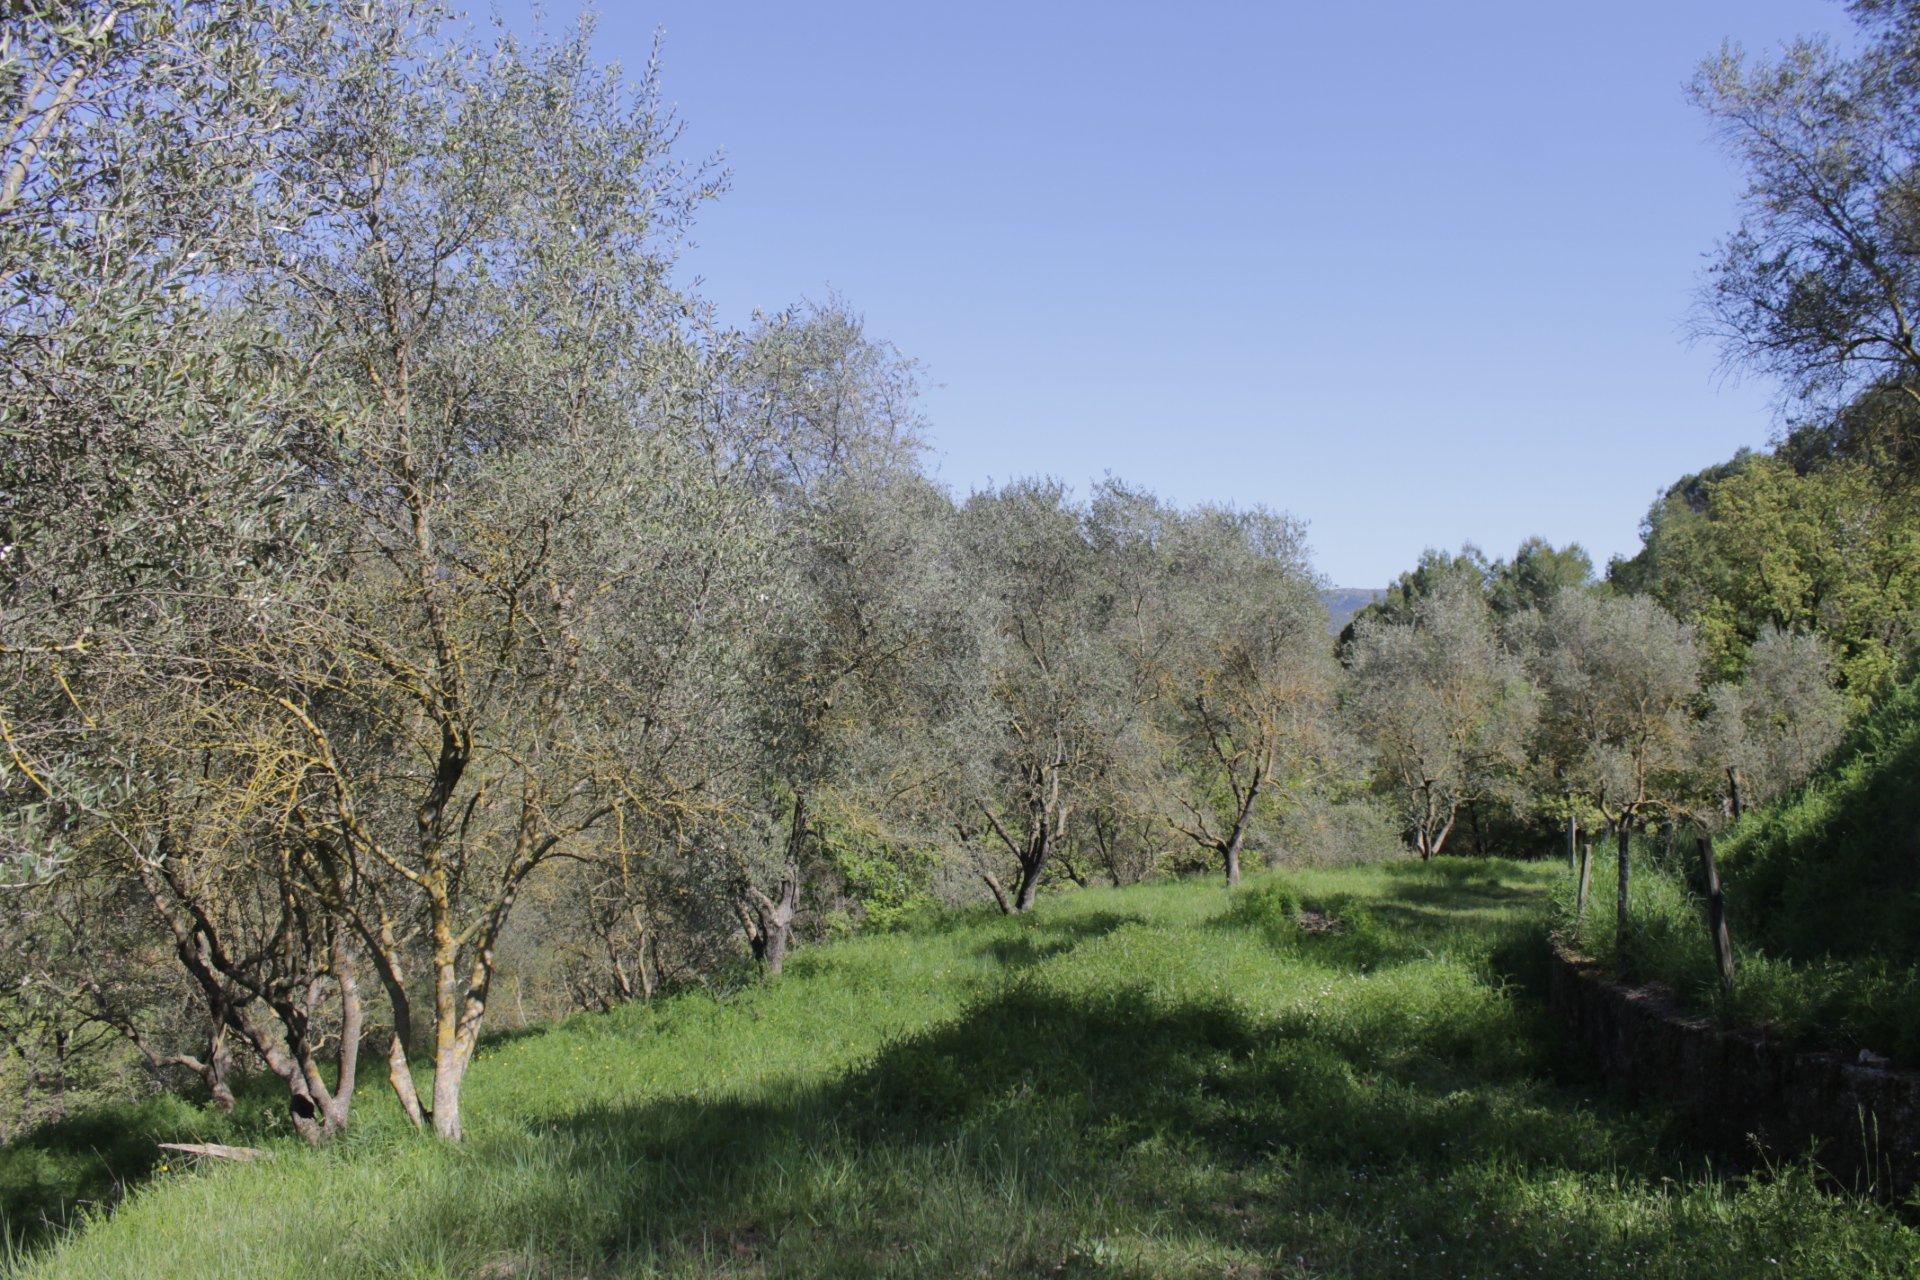 CONTES! Terrain agricole